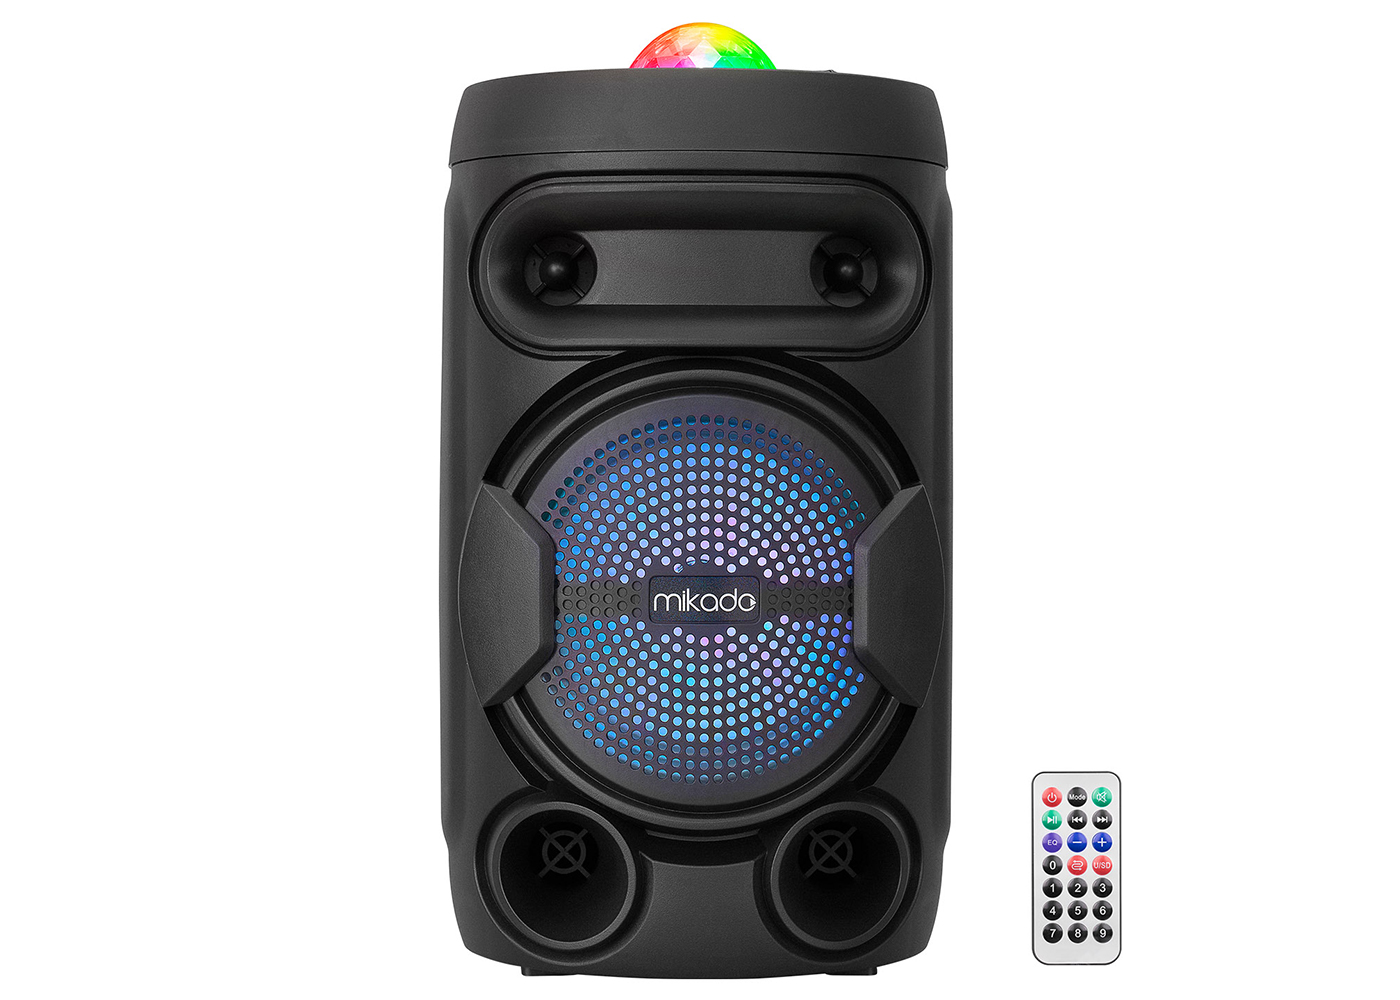 Mikado MD-602KP 3.7V 1500mAH Siyah Kablolu Mikrofon Toplantı Anfisi USB/FM/Bluetooth/TWS/RGB Ledli